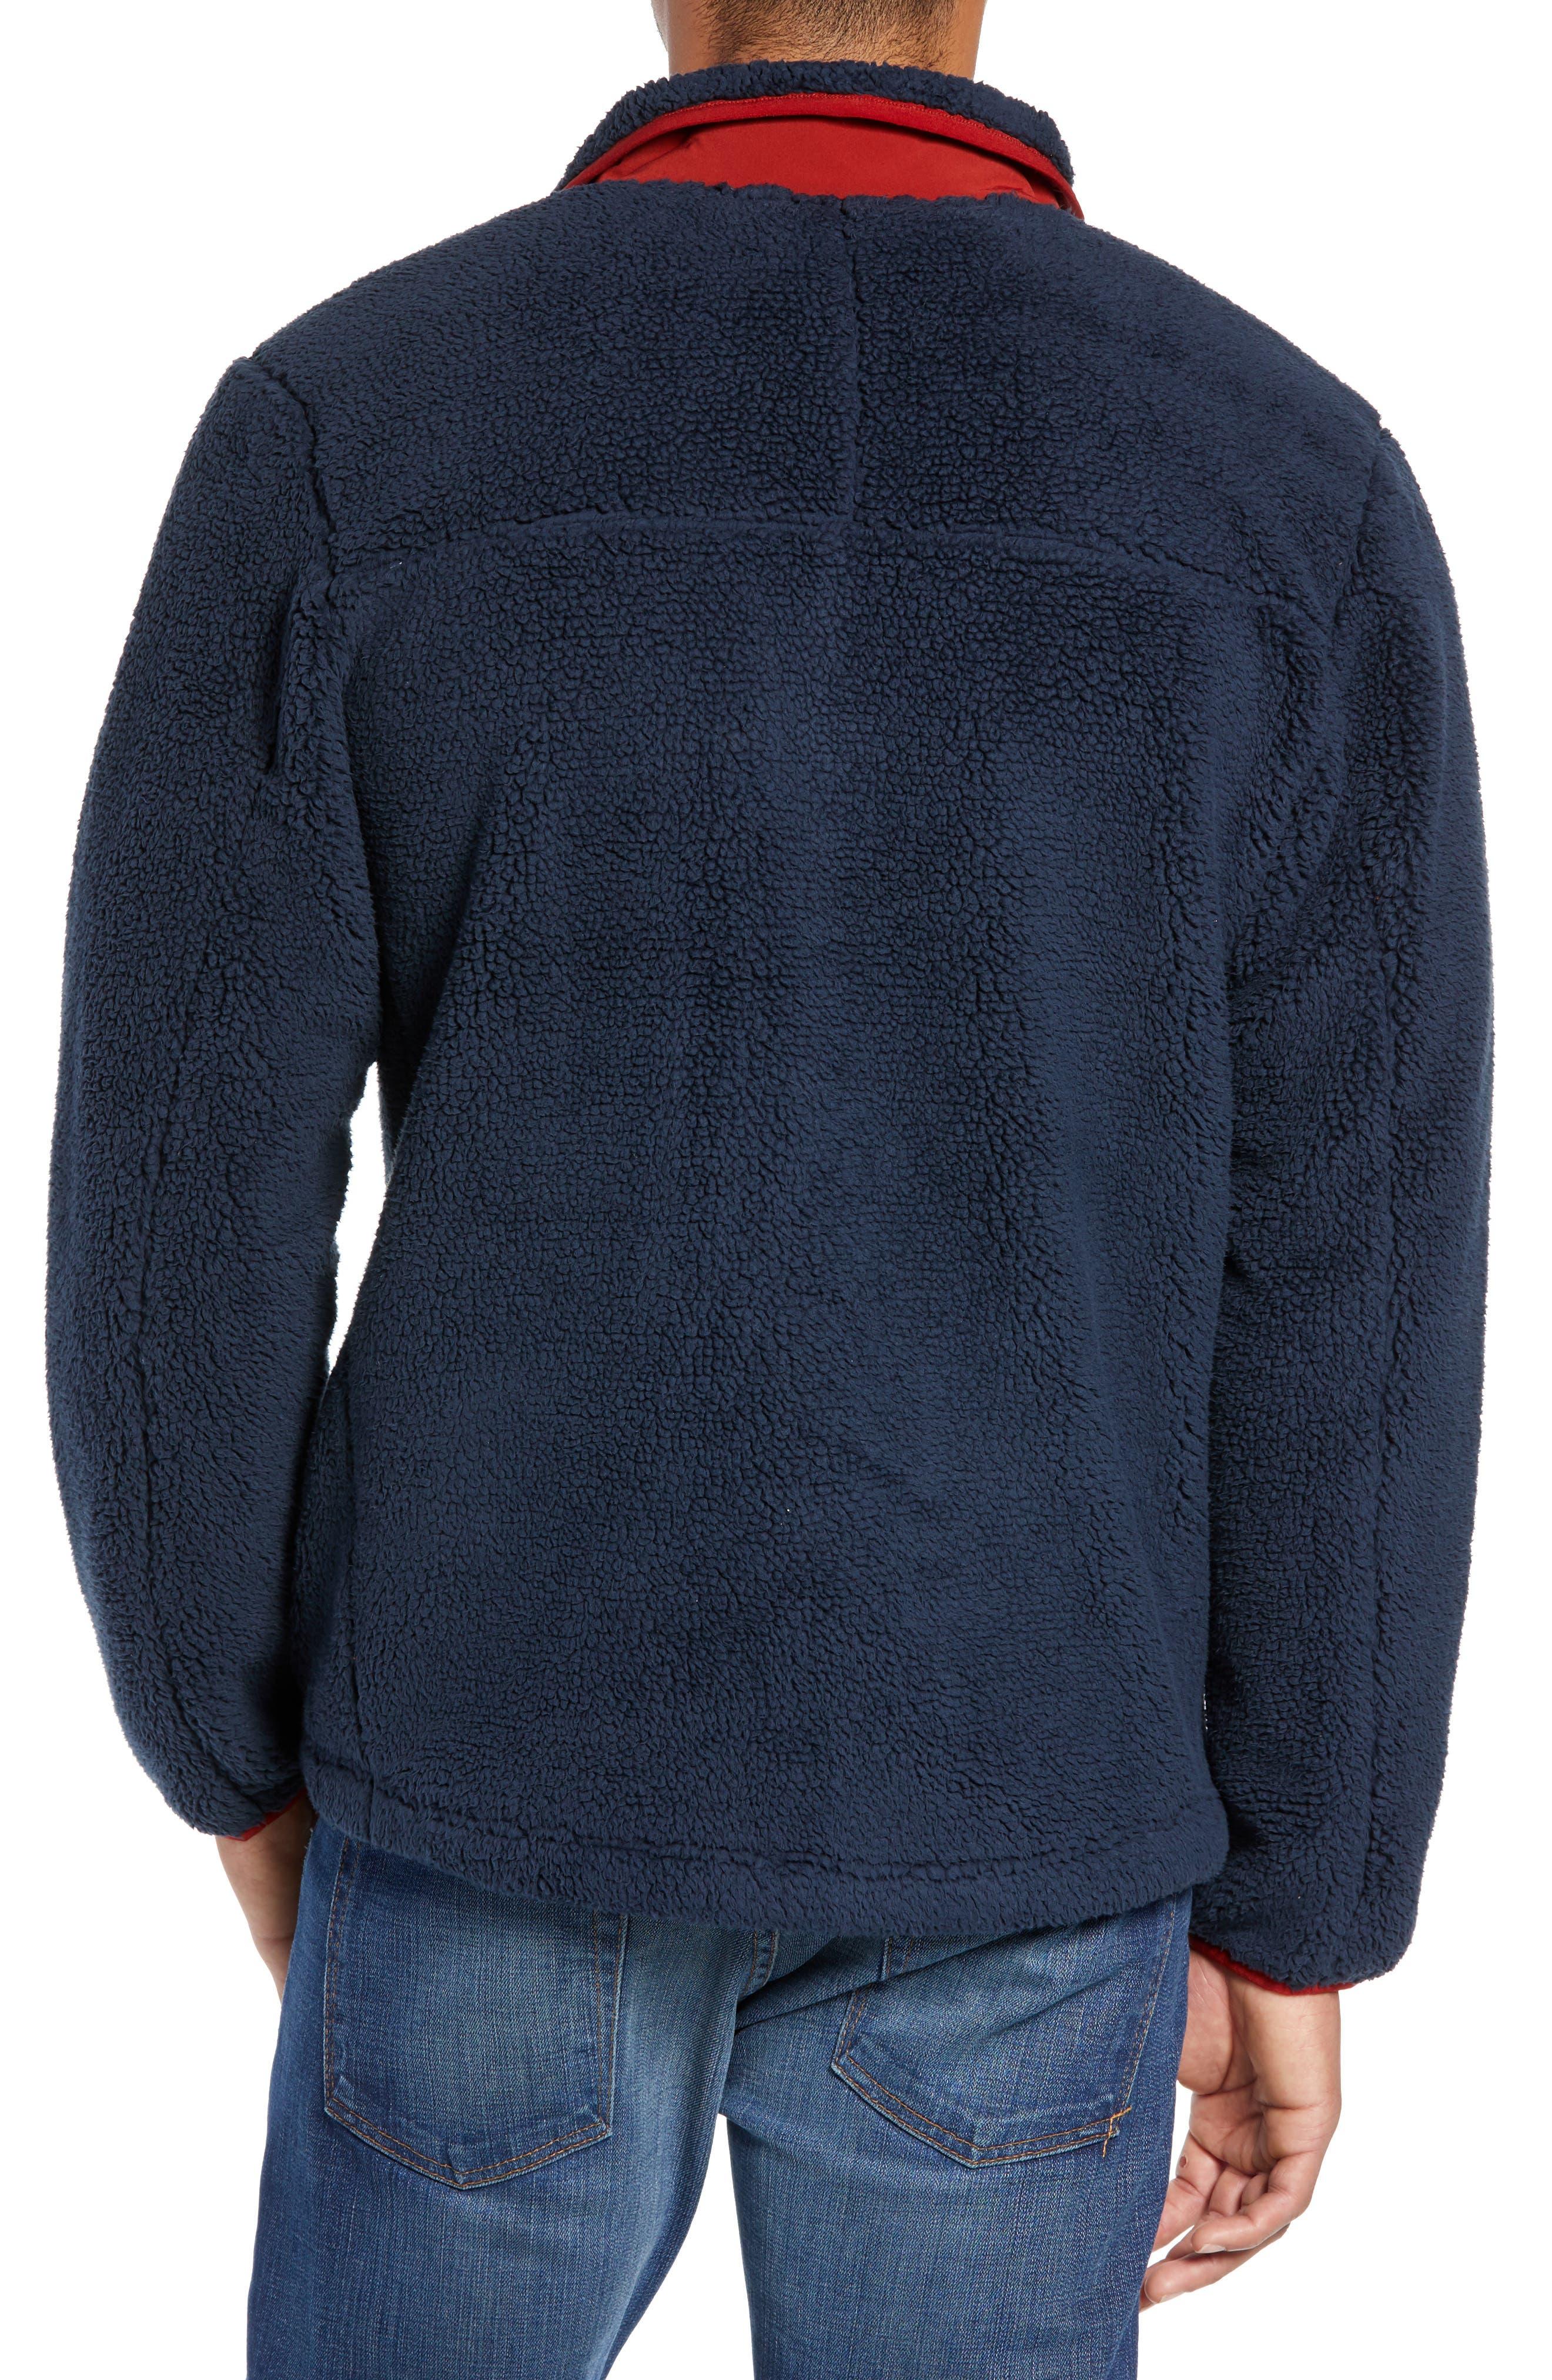 Campshire Zip Fleece Jacket,                             Alternate thumbnail 20, color,